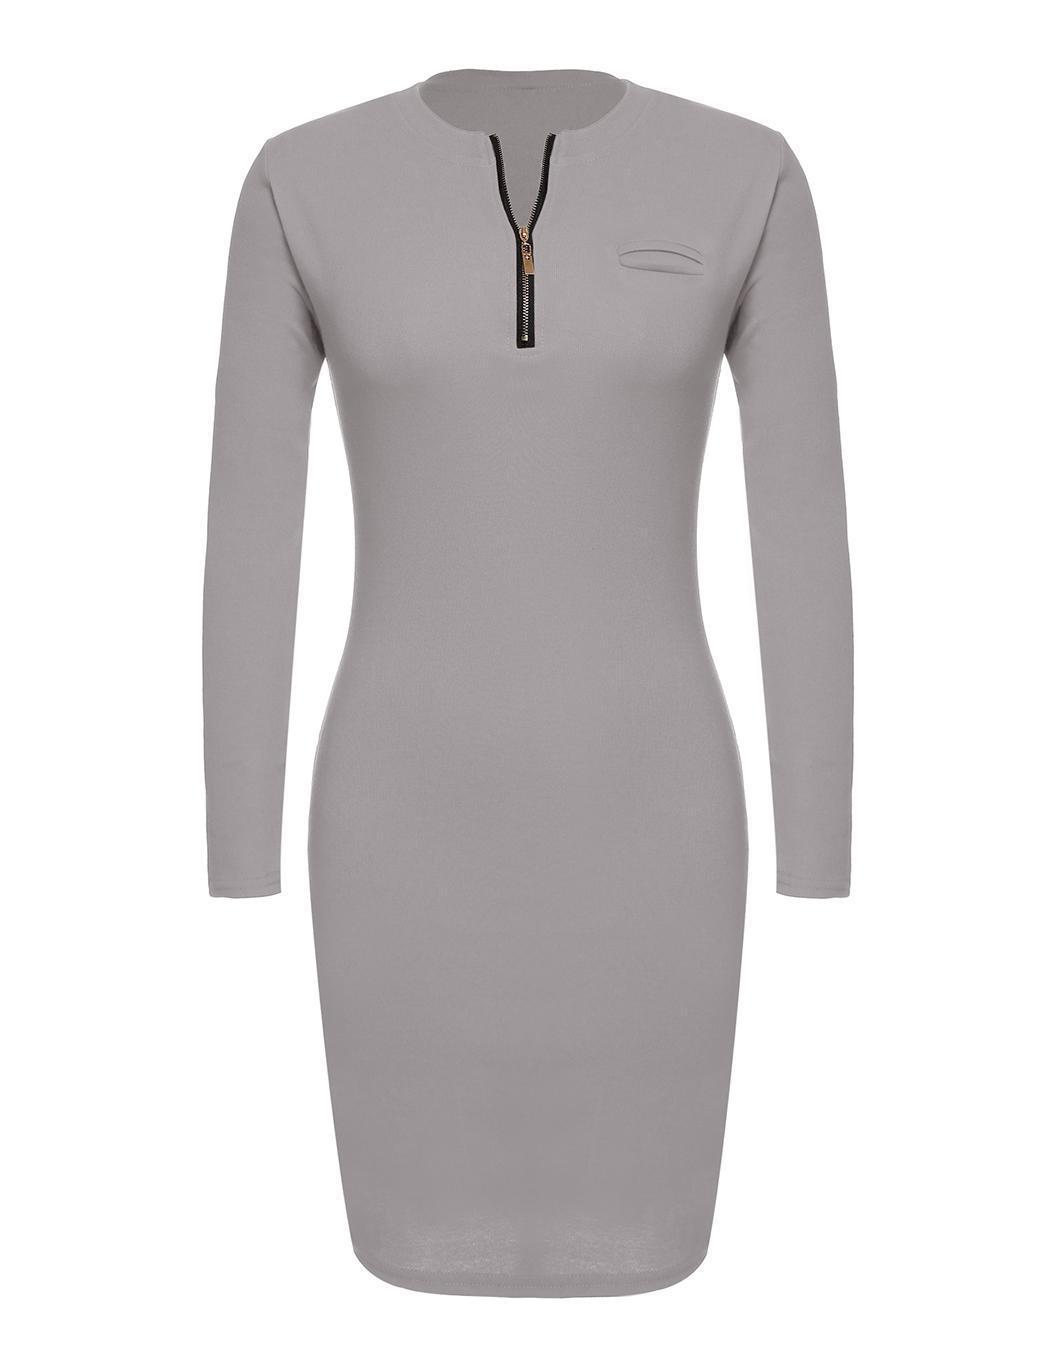 Women Career Long Sleeve Stretch Bodycon Slim Dress 1